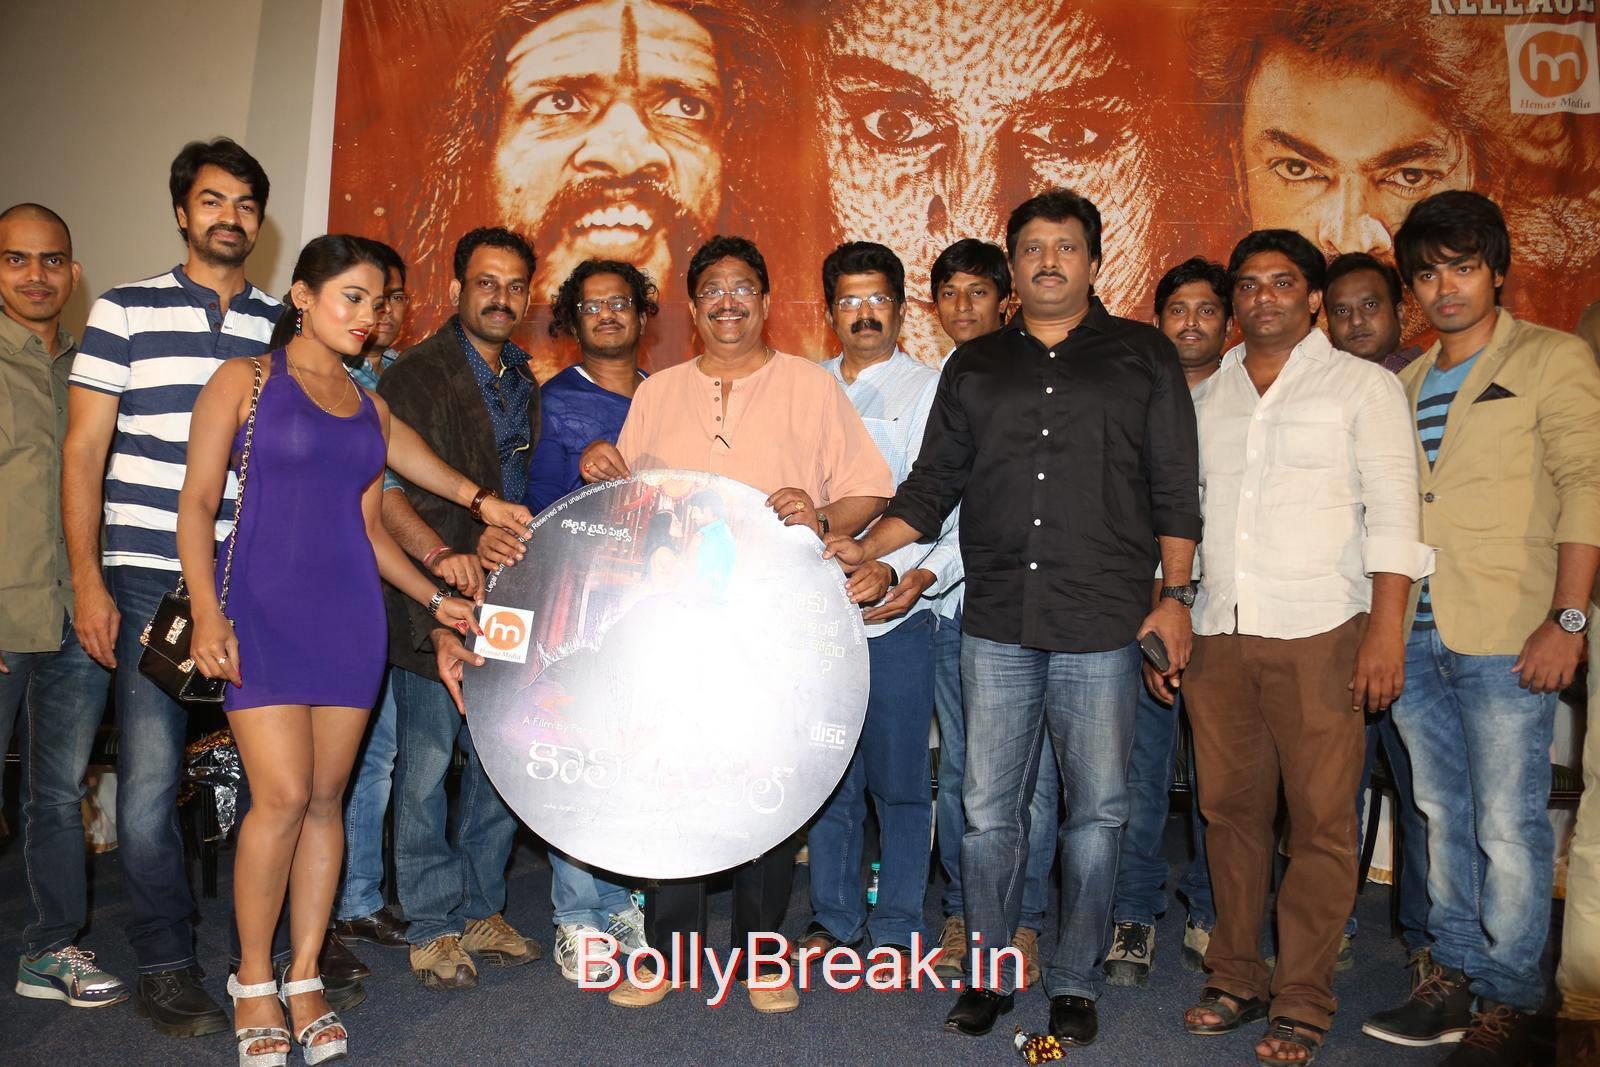 Ravi Varma-Calling Bell Movie Audio Launch Photo Gallery, Lucky, Vriti Khanna,Mamatha Rahuth Hot Pics From Calling Bell Movie Audio Launch